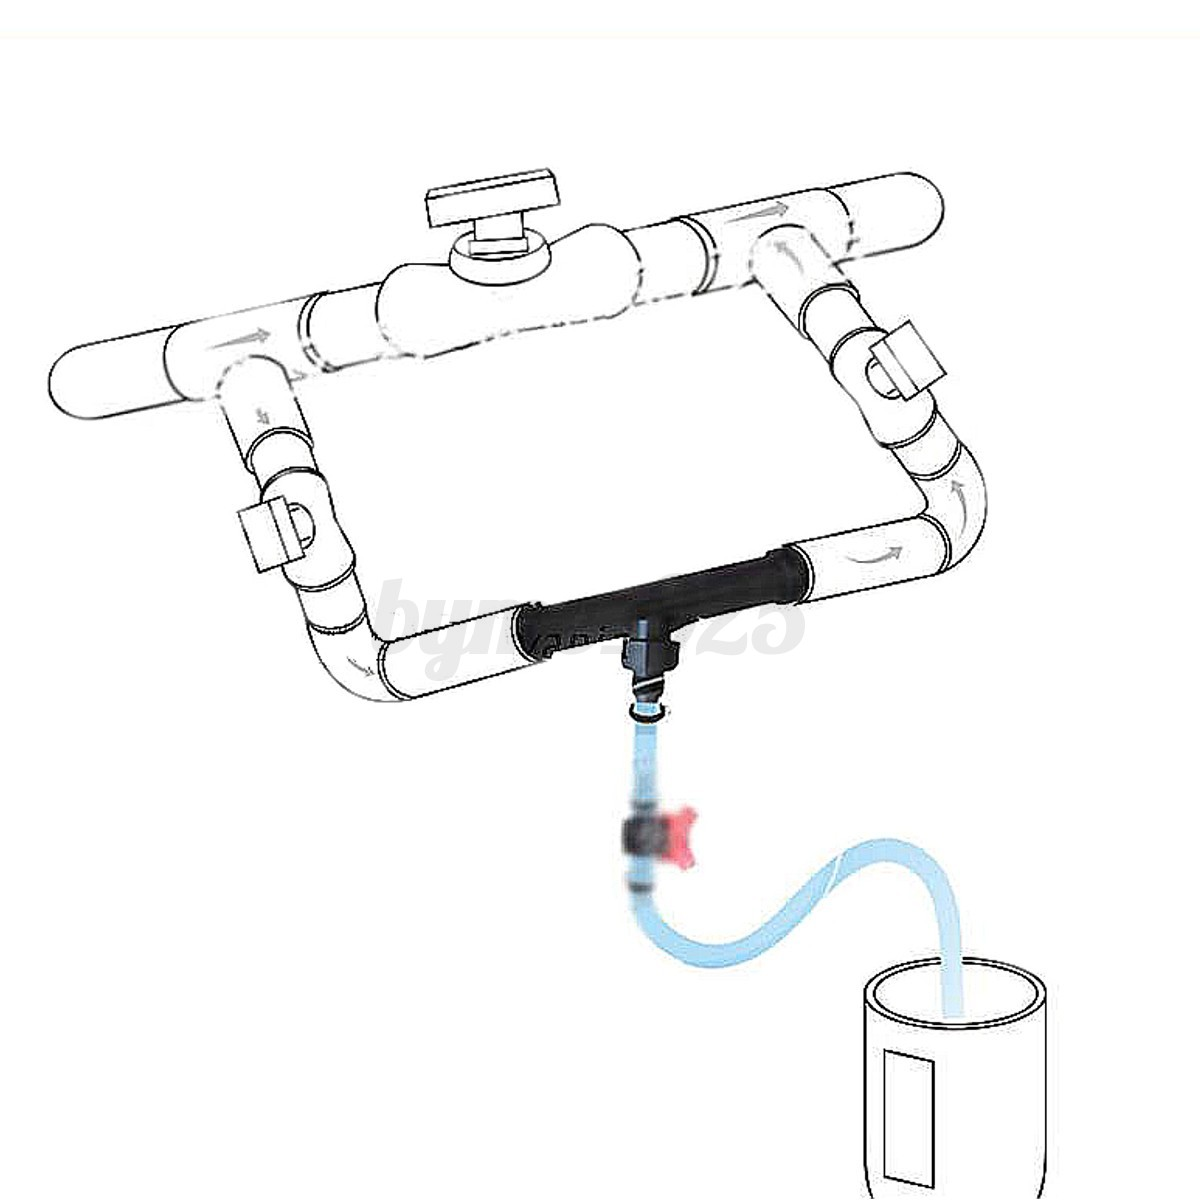 3  4 u0026 39  u0026 39  garden irrigation venturi fertilizer injector   switch water tube kit